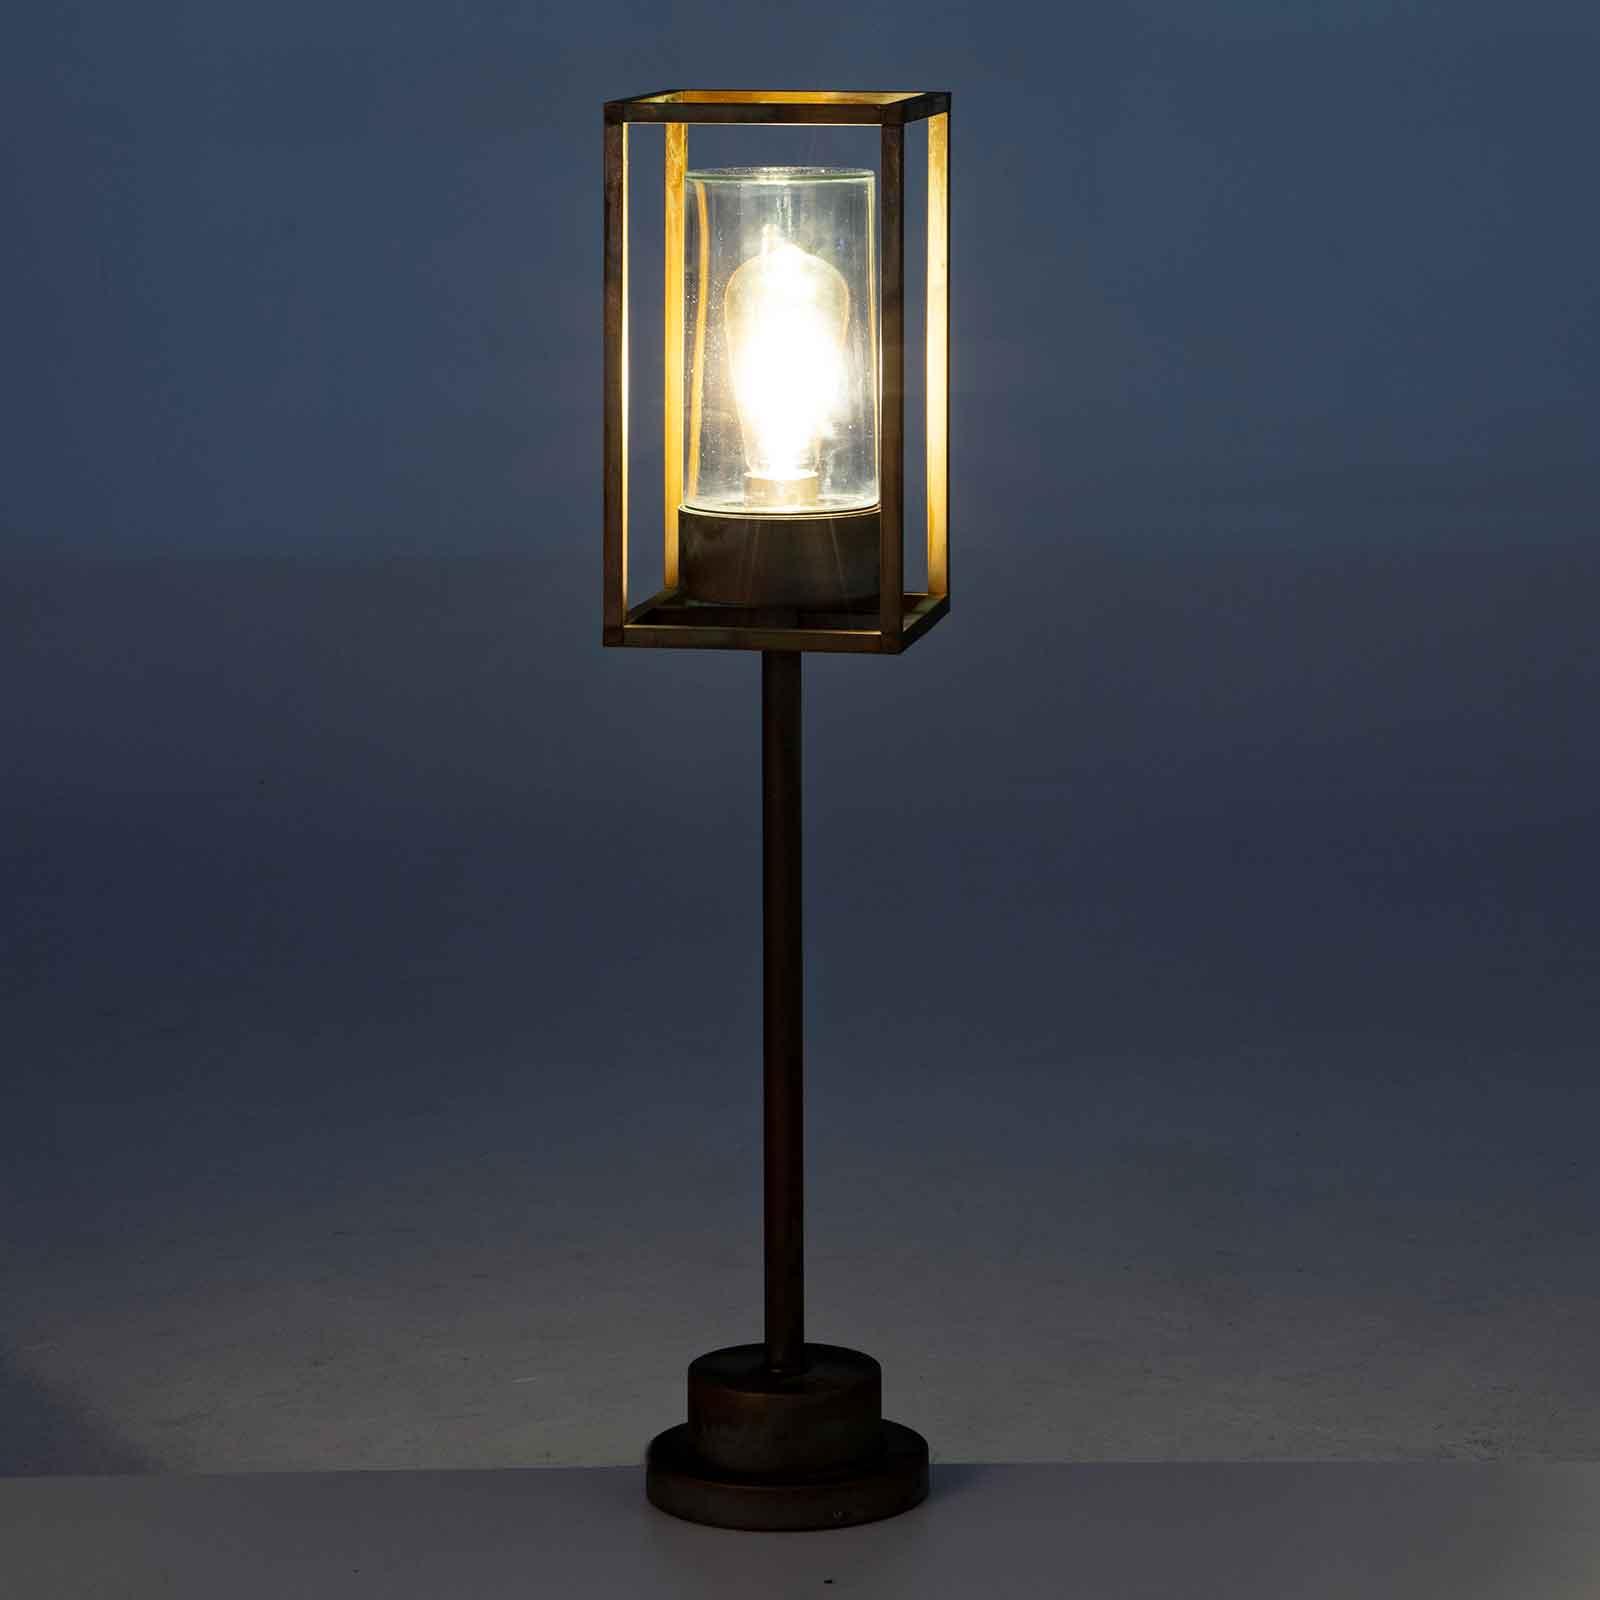 Cubic³ 3370 veilampe antikk messing/klar